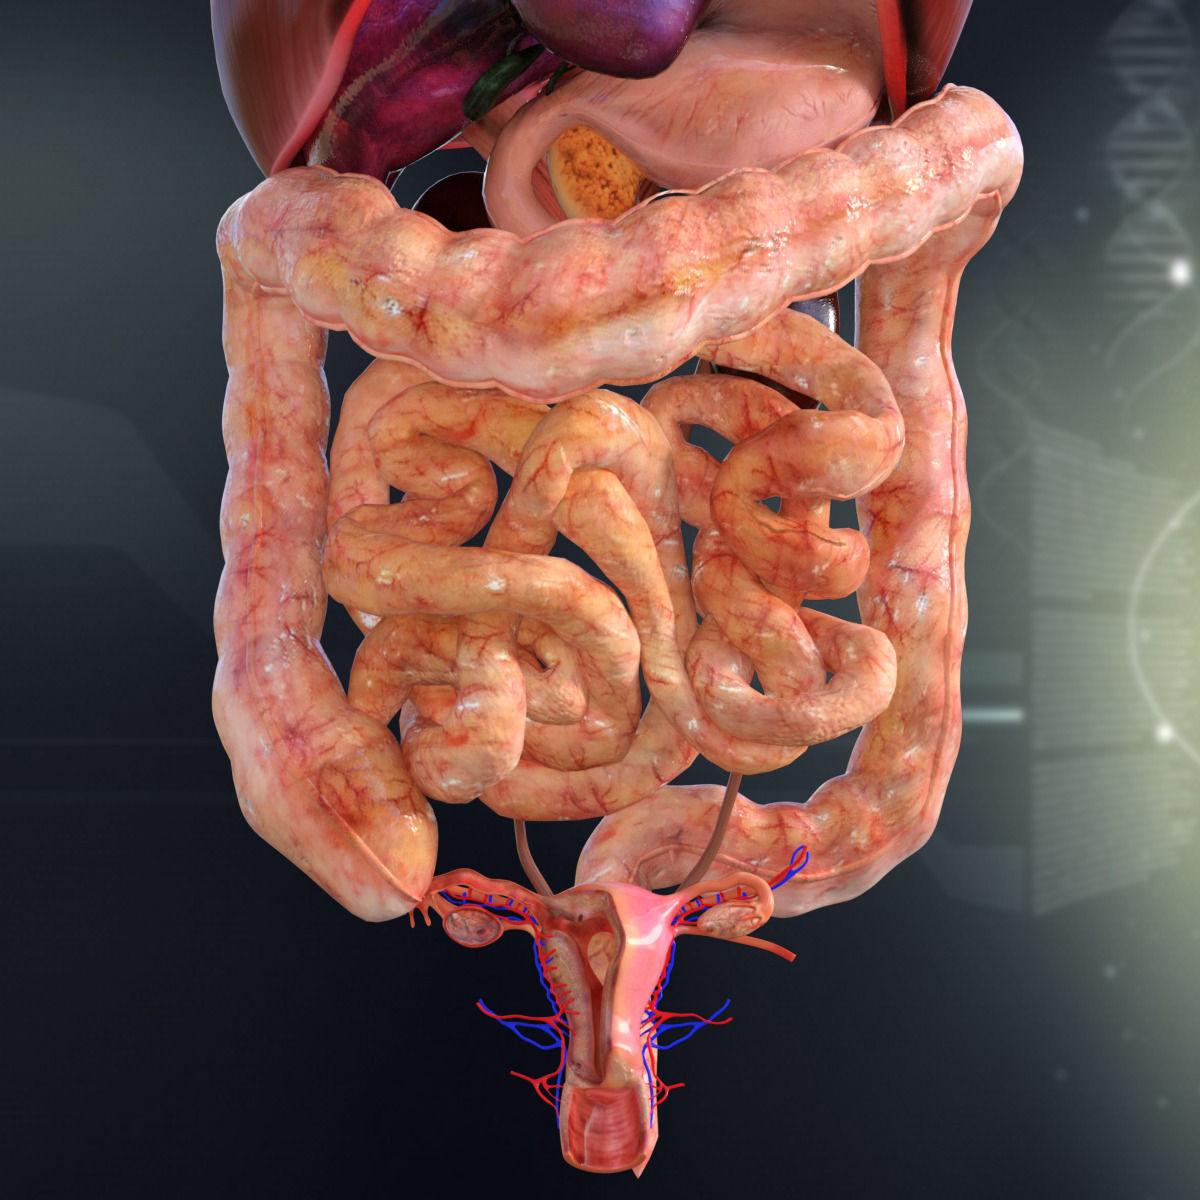 Human Female Internal Organs Anatomy 3D | CGTrader